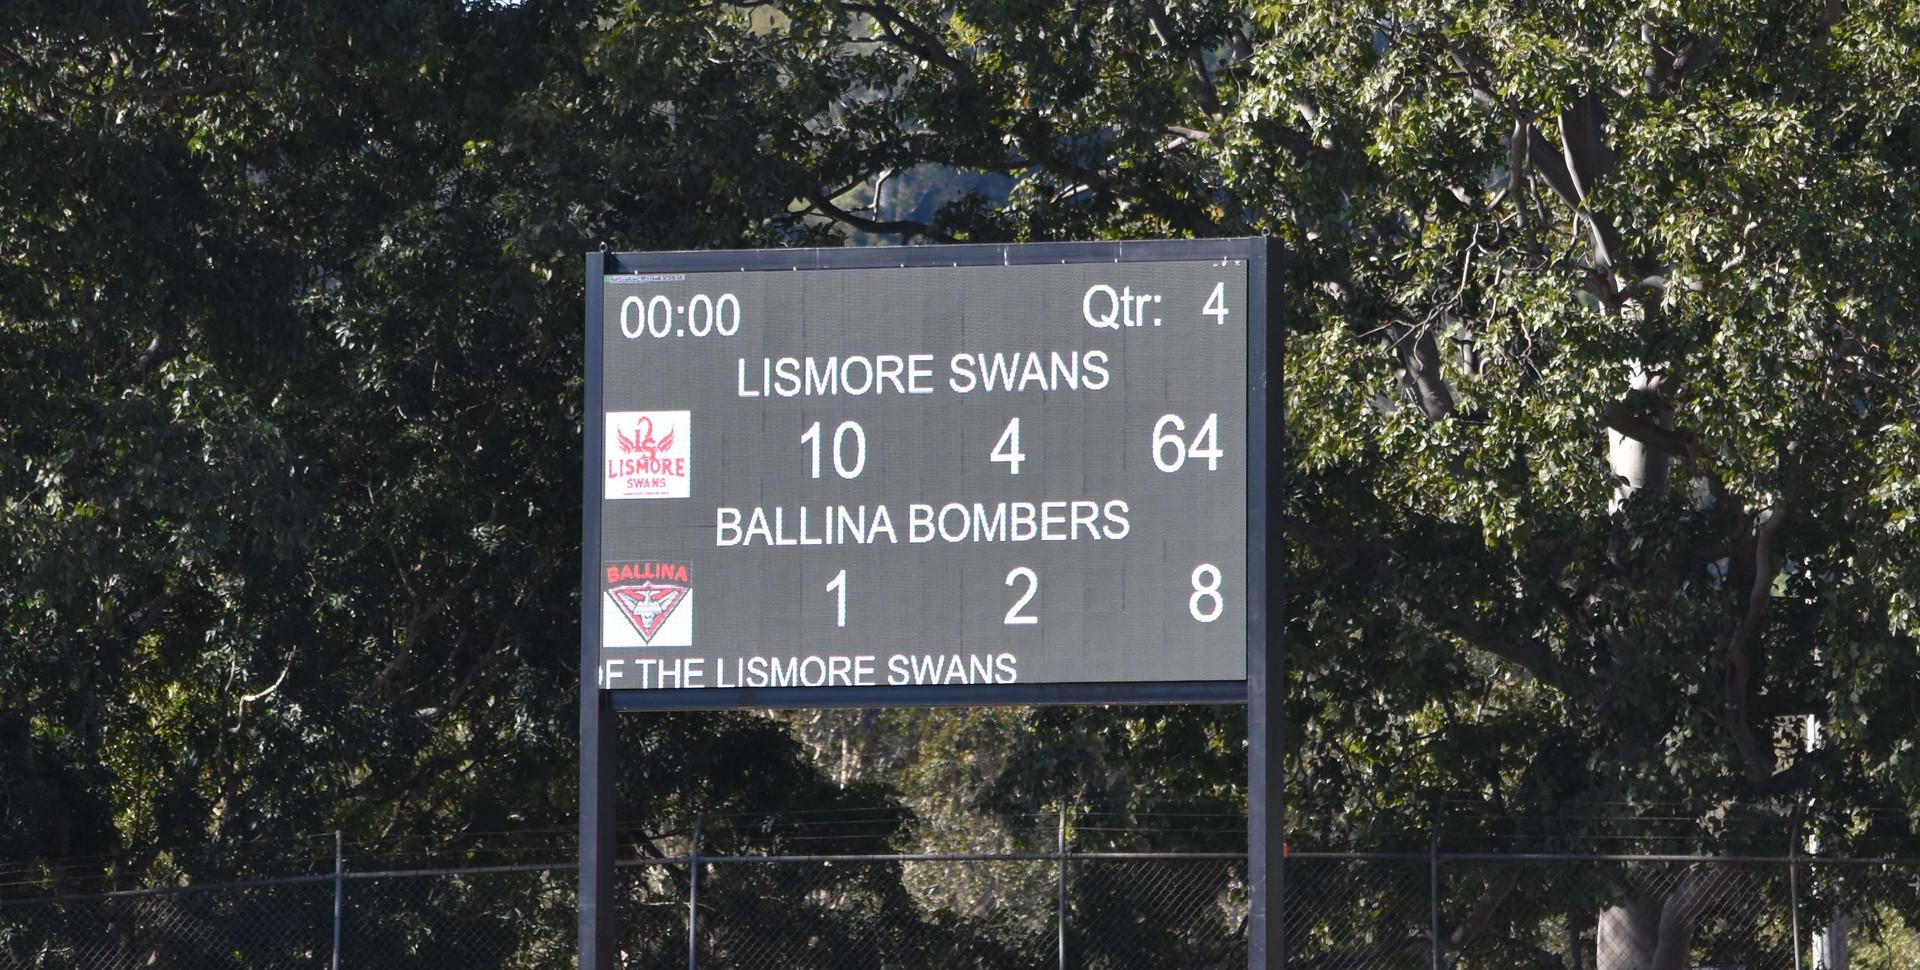 Our Electronic Scoreboard